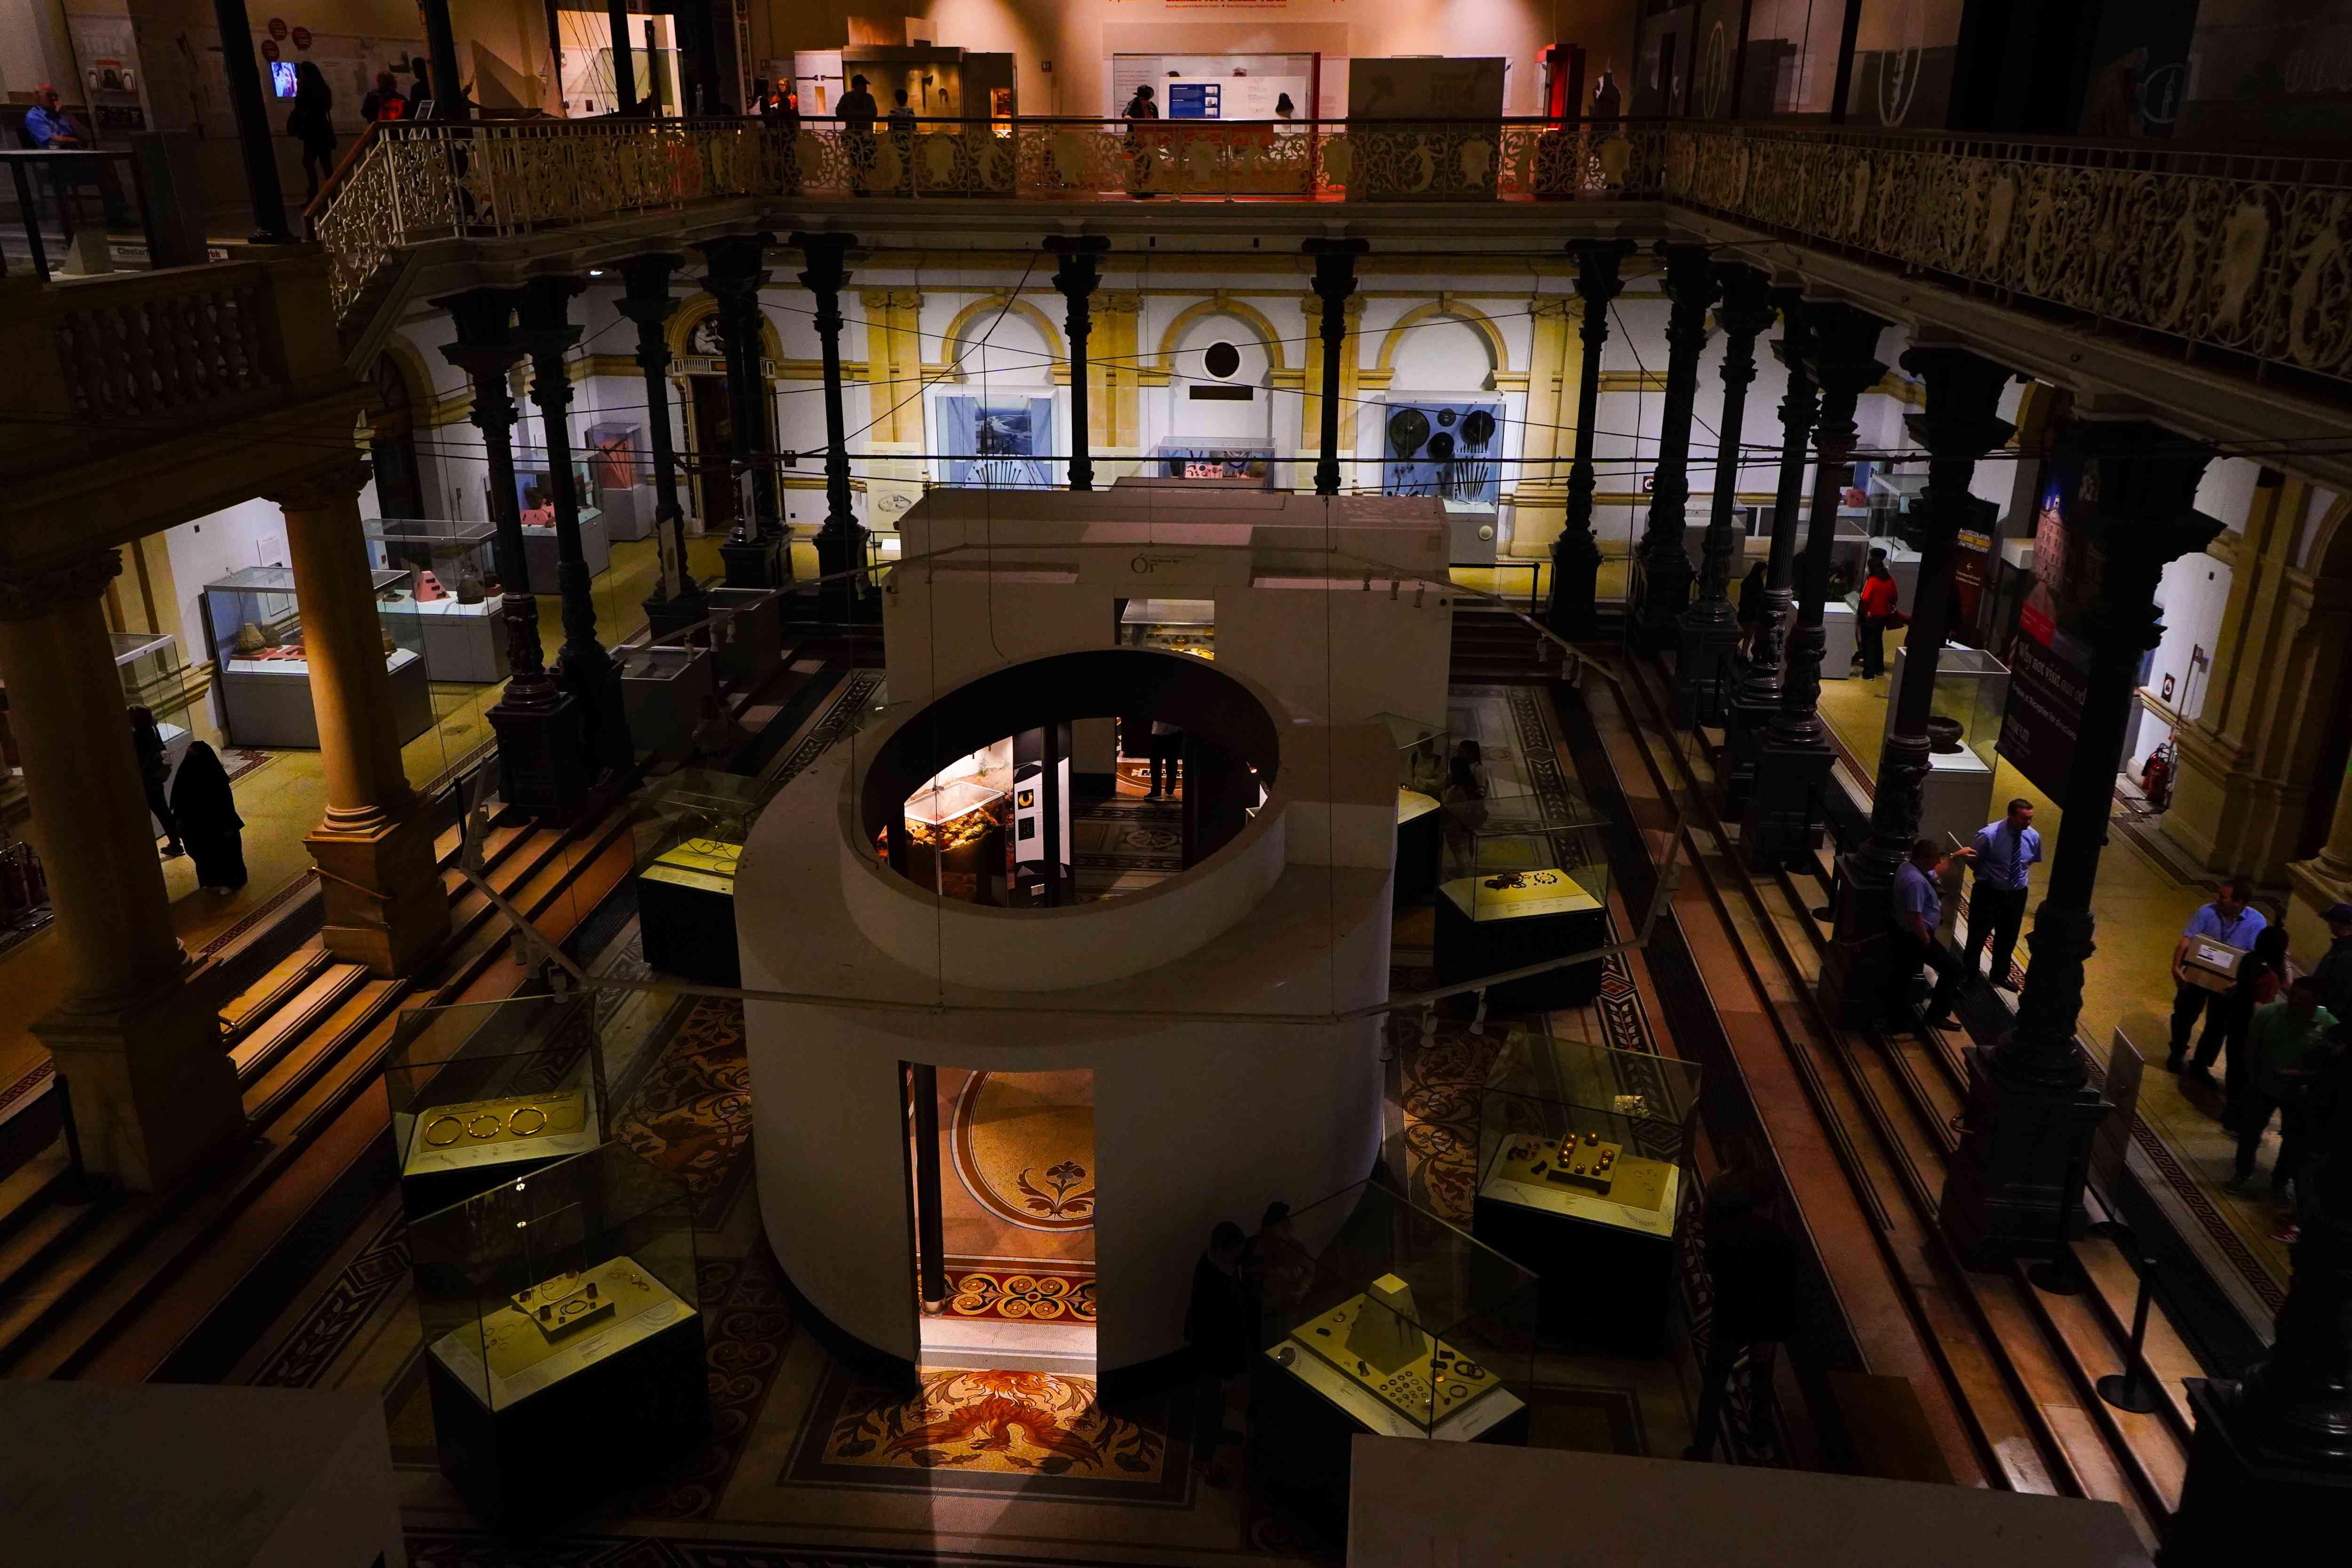 National Museum of Ireland in Dublin